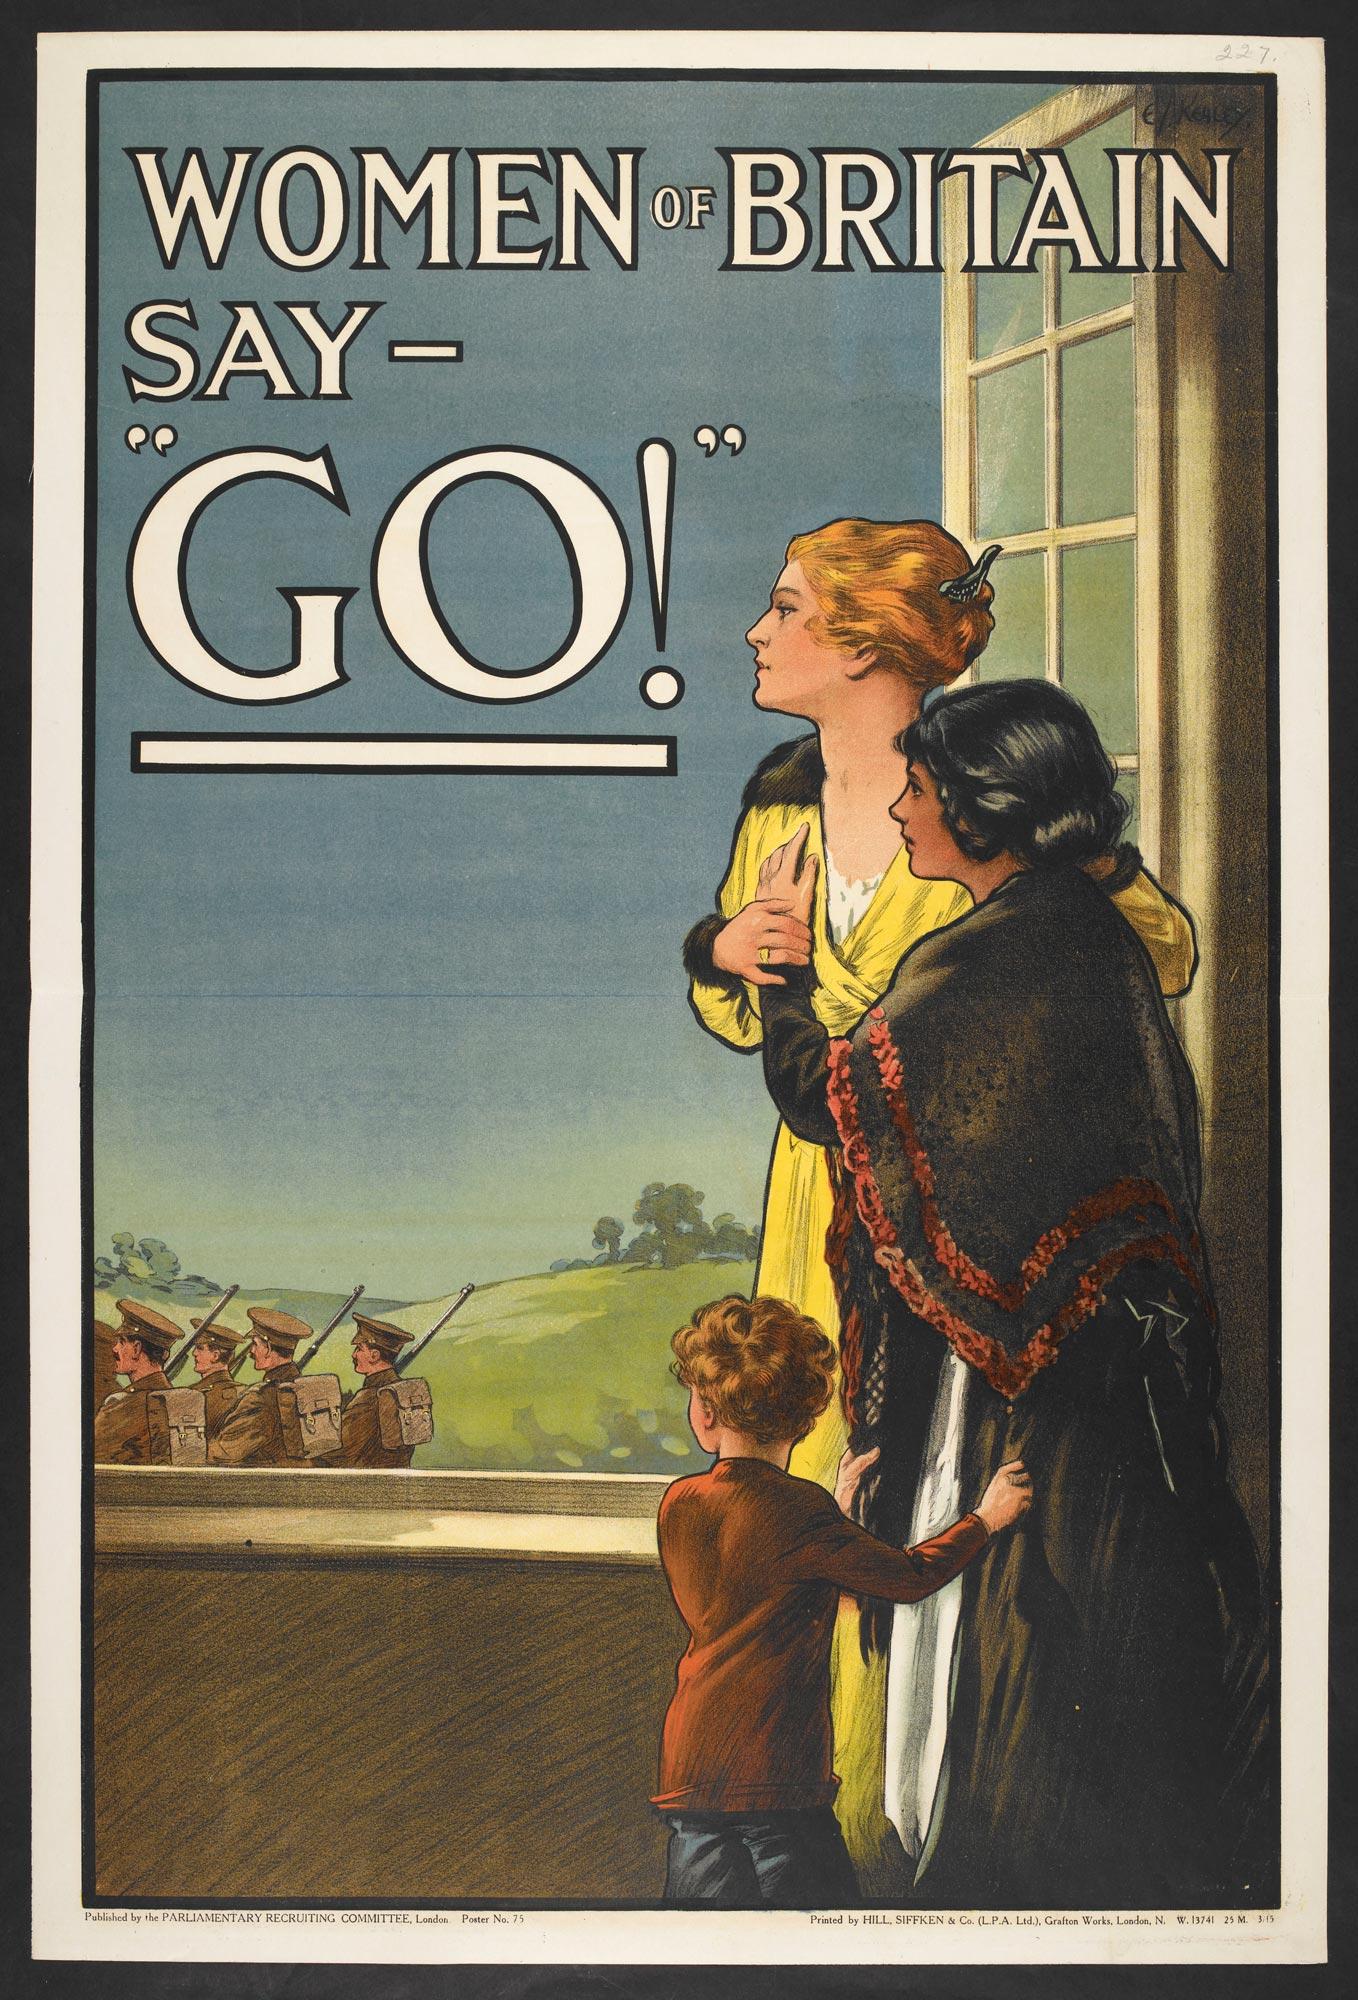 Propaganda for patriotism and nationalism - The British ...